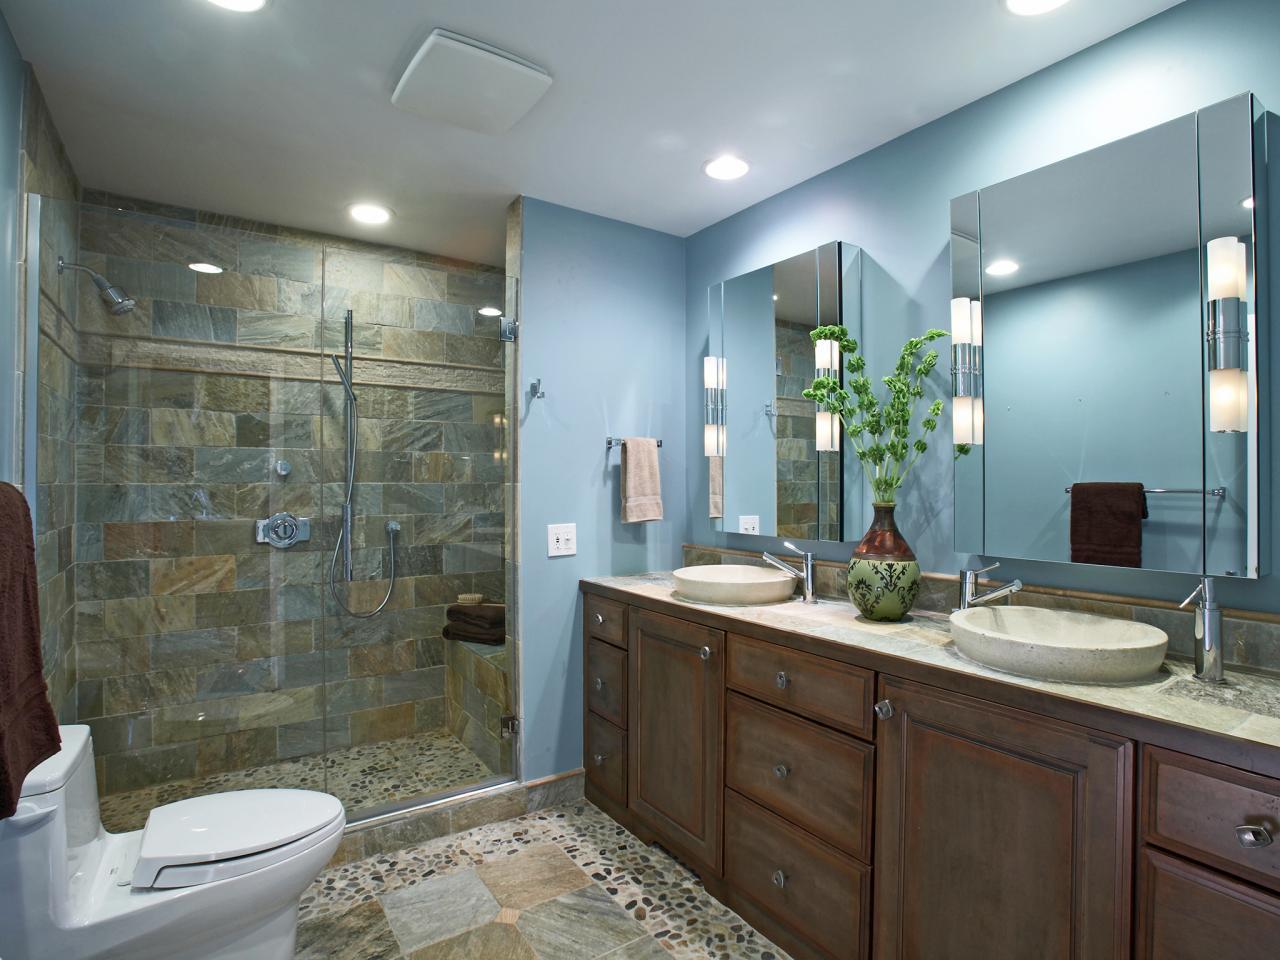 Original_Jackie-Dishner-Luxury-Showers-Mark-Zancanaro-Casual-Shower_4x3